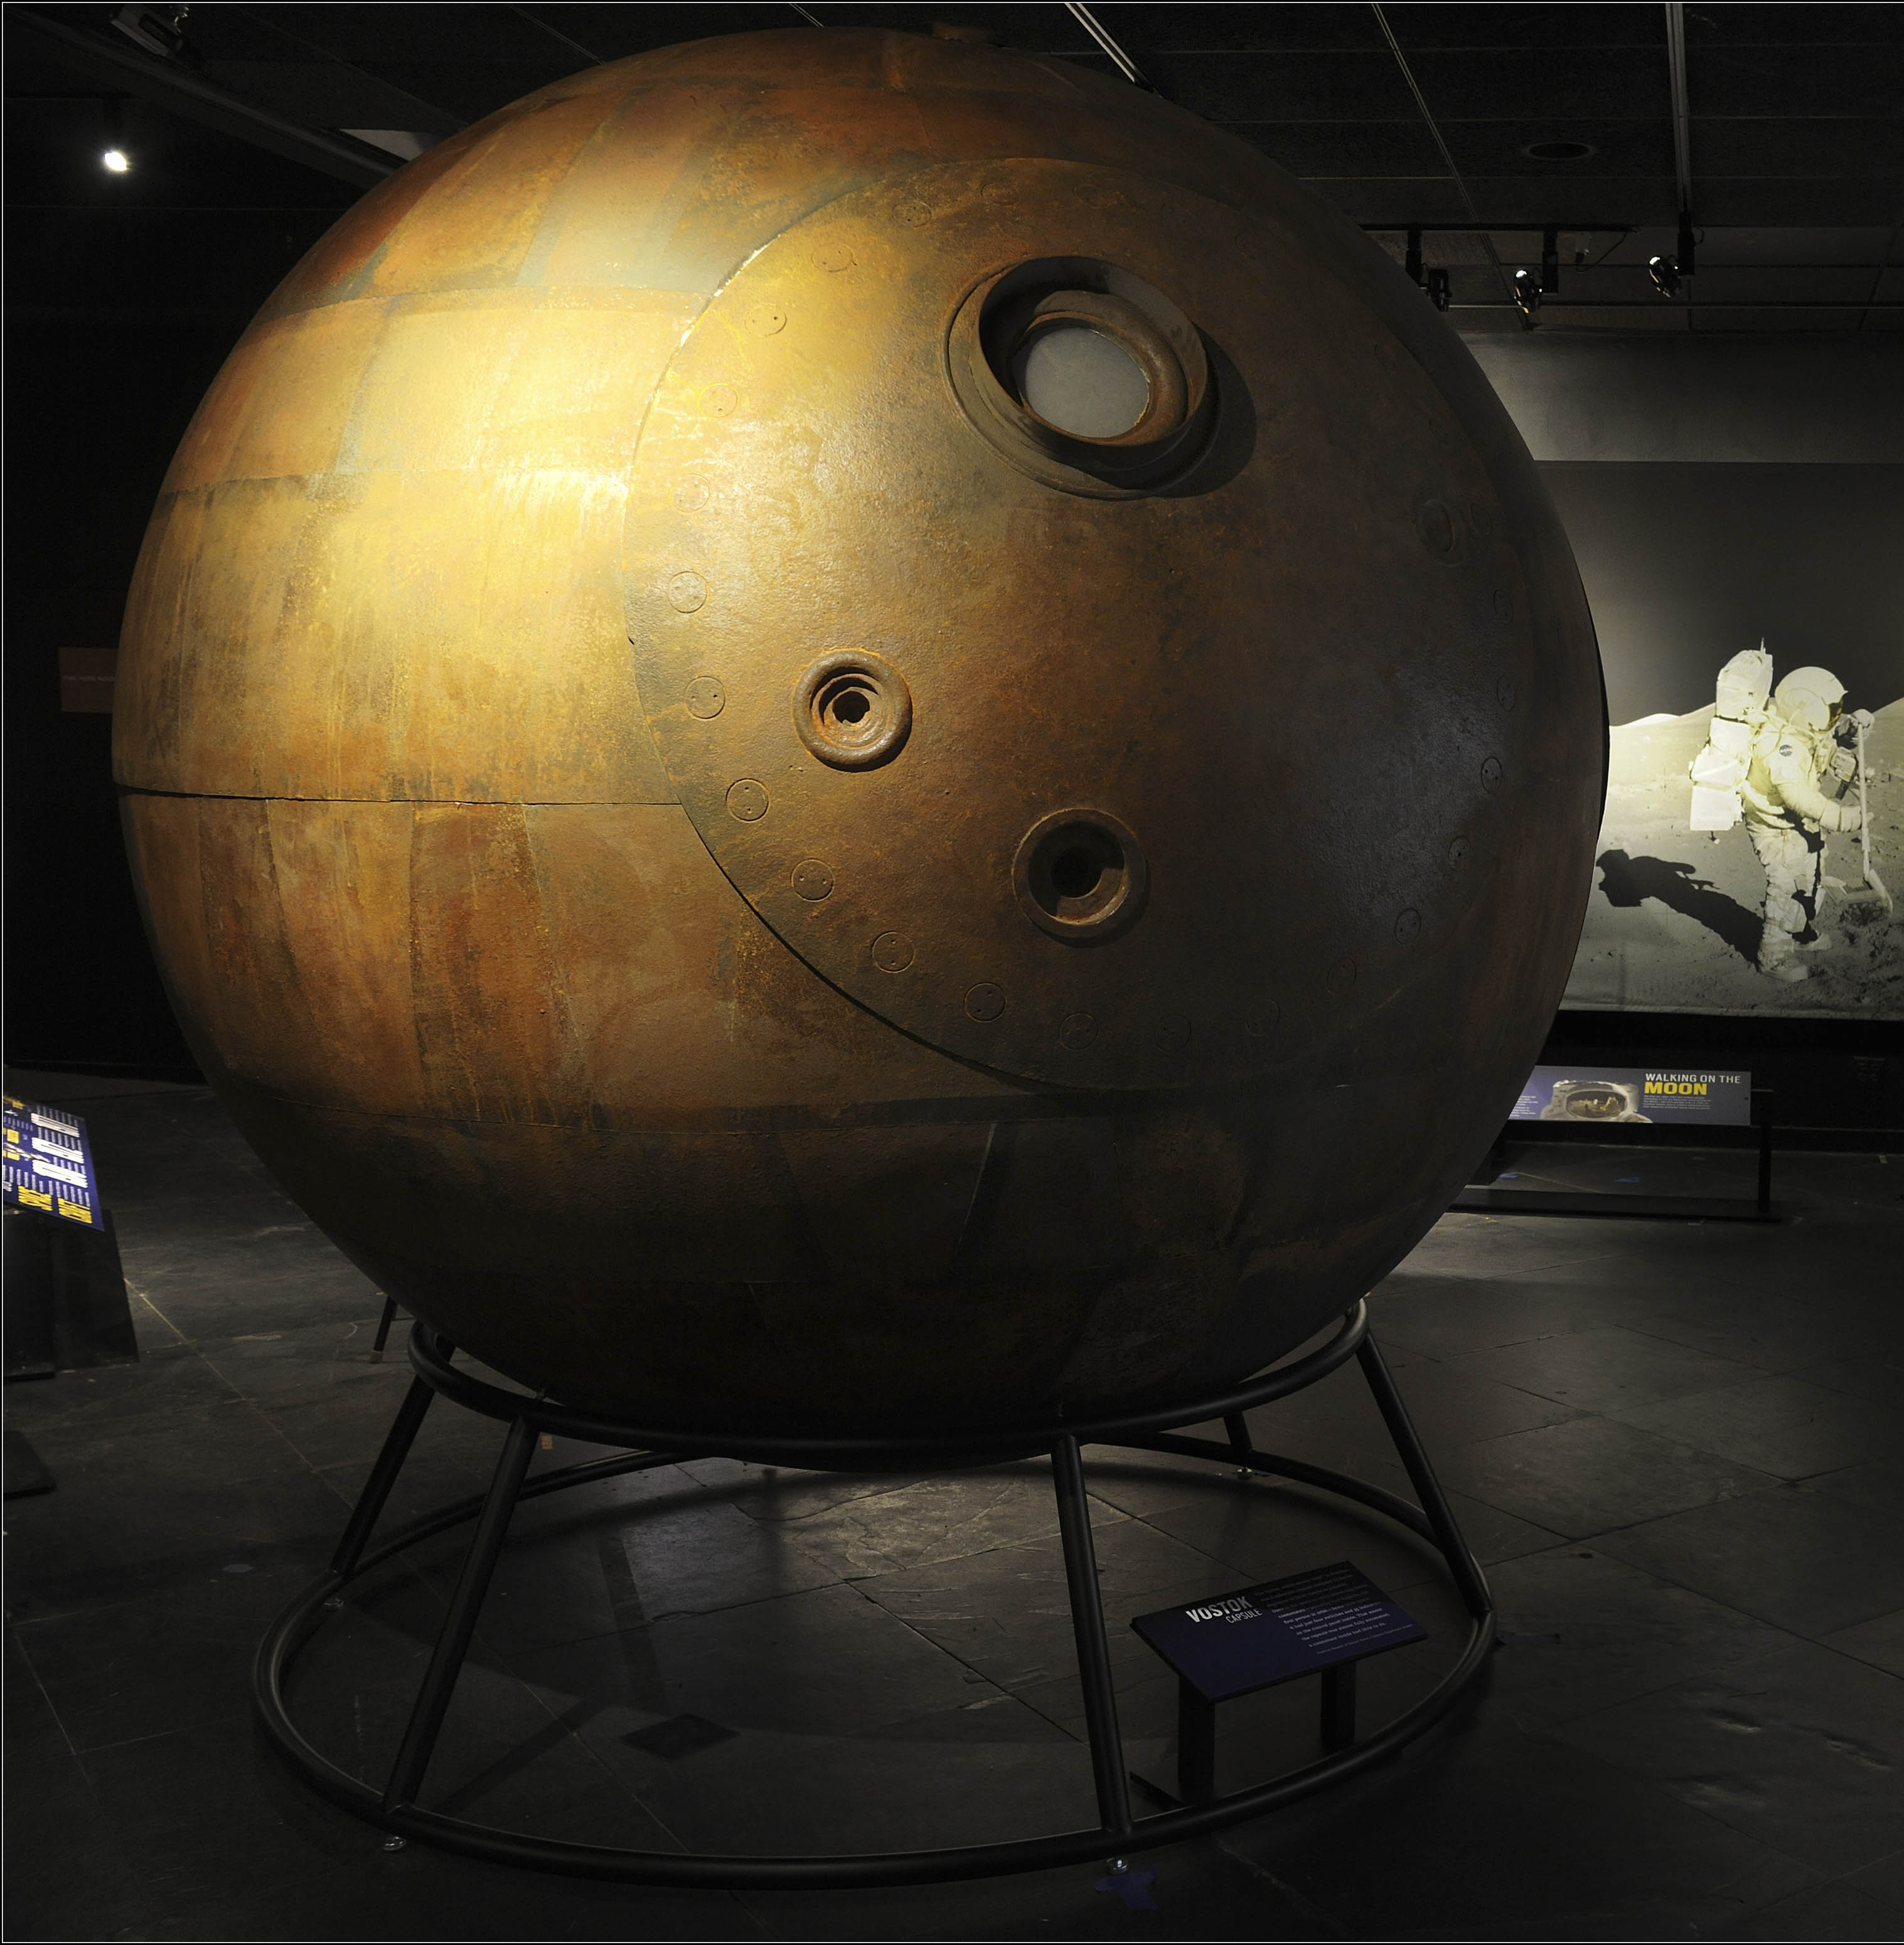 Model Vostok Capsule